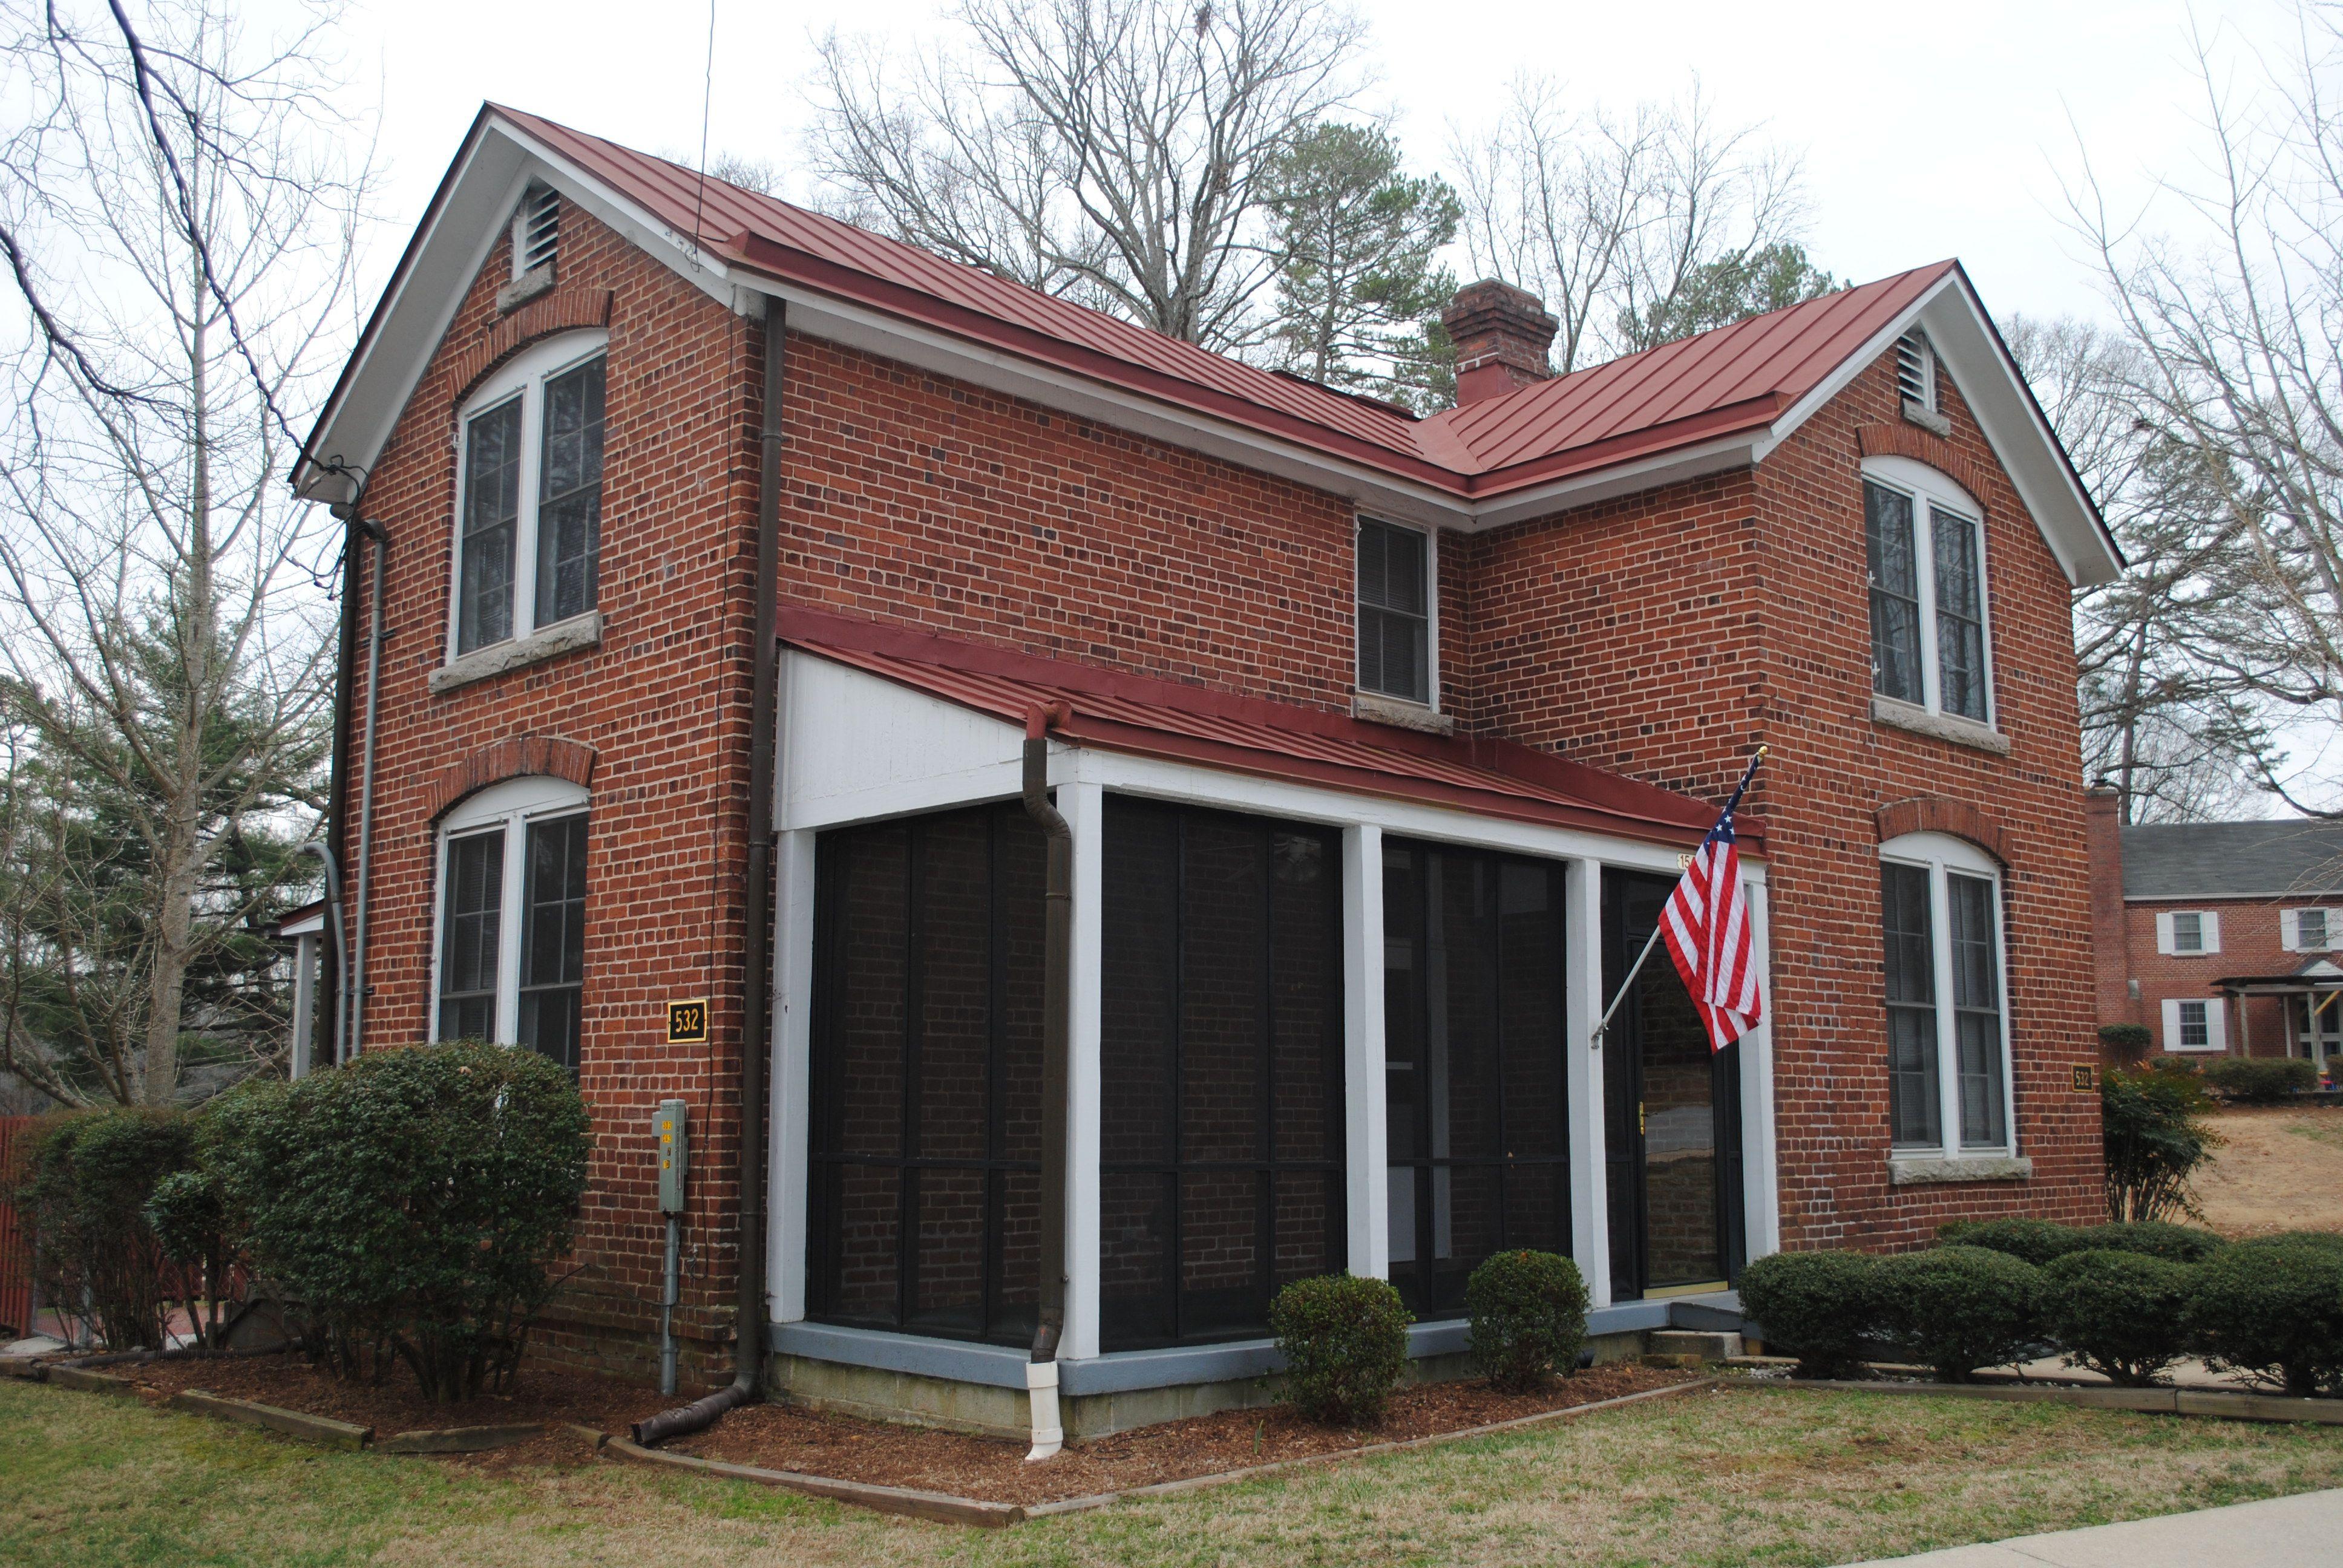 1740 house tripadvisor - Community Residential District